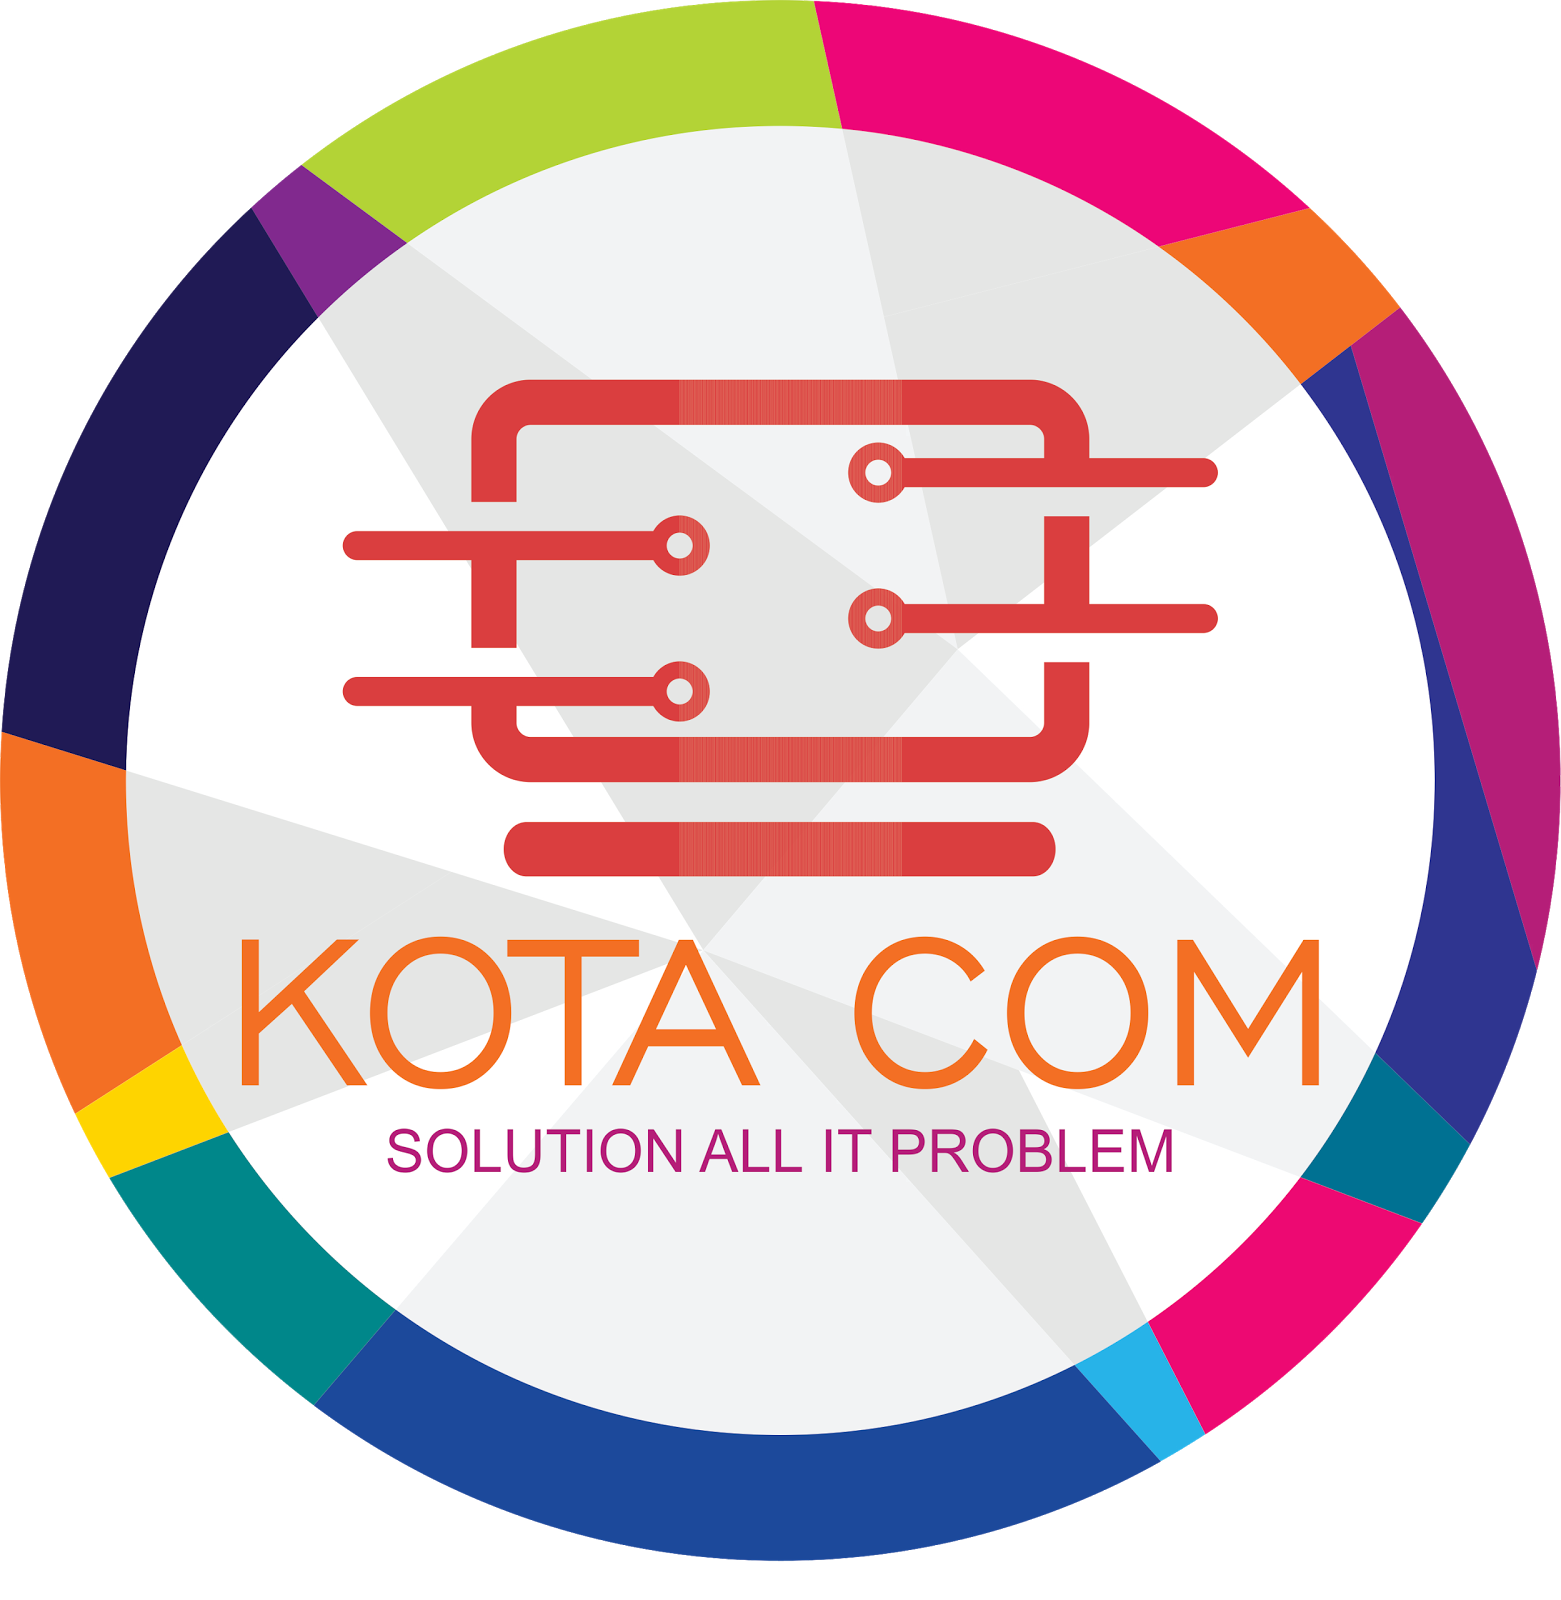 Blog Kotacom Page 4 Of 5 Service Komputer Surabaya Flashdisk 8 Gb Paket Software Design Adobe Photoshop After Effect Audition Illustrator Premiere Pro Cc 2017 Jual Multiboot Install Ulang Bonus Driverpack 16gb 32gb Windows 7 81 10 32bit Dan 64bit All In One